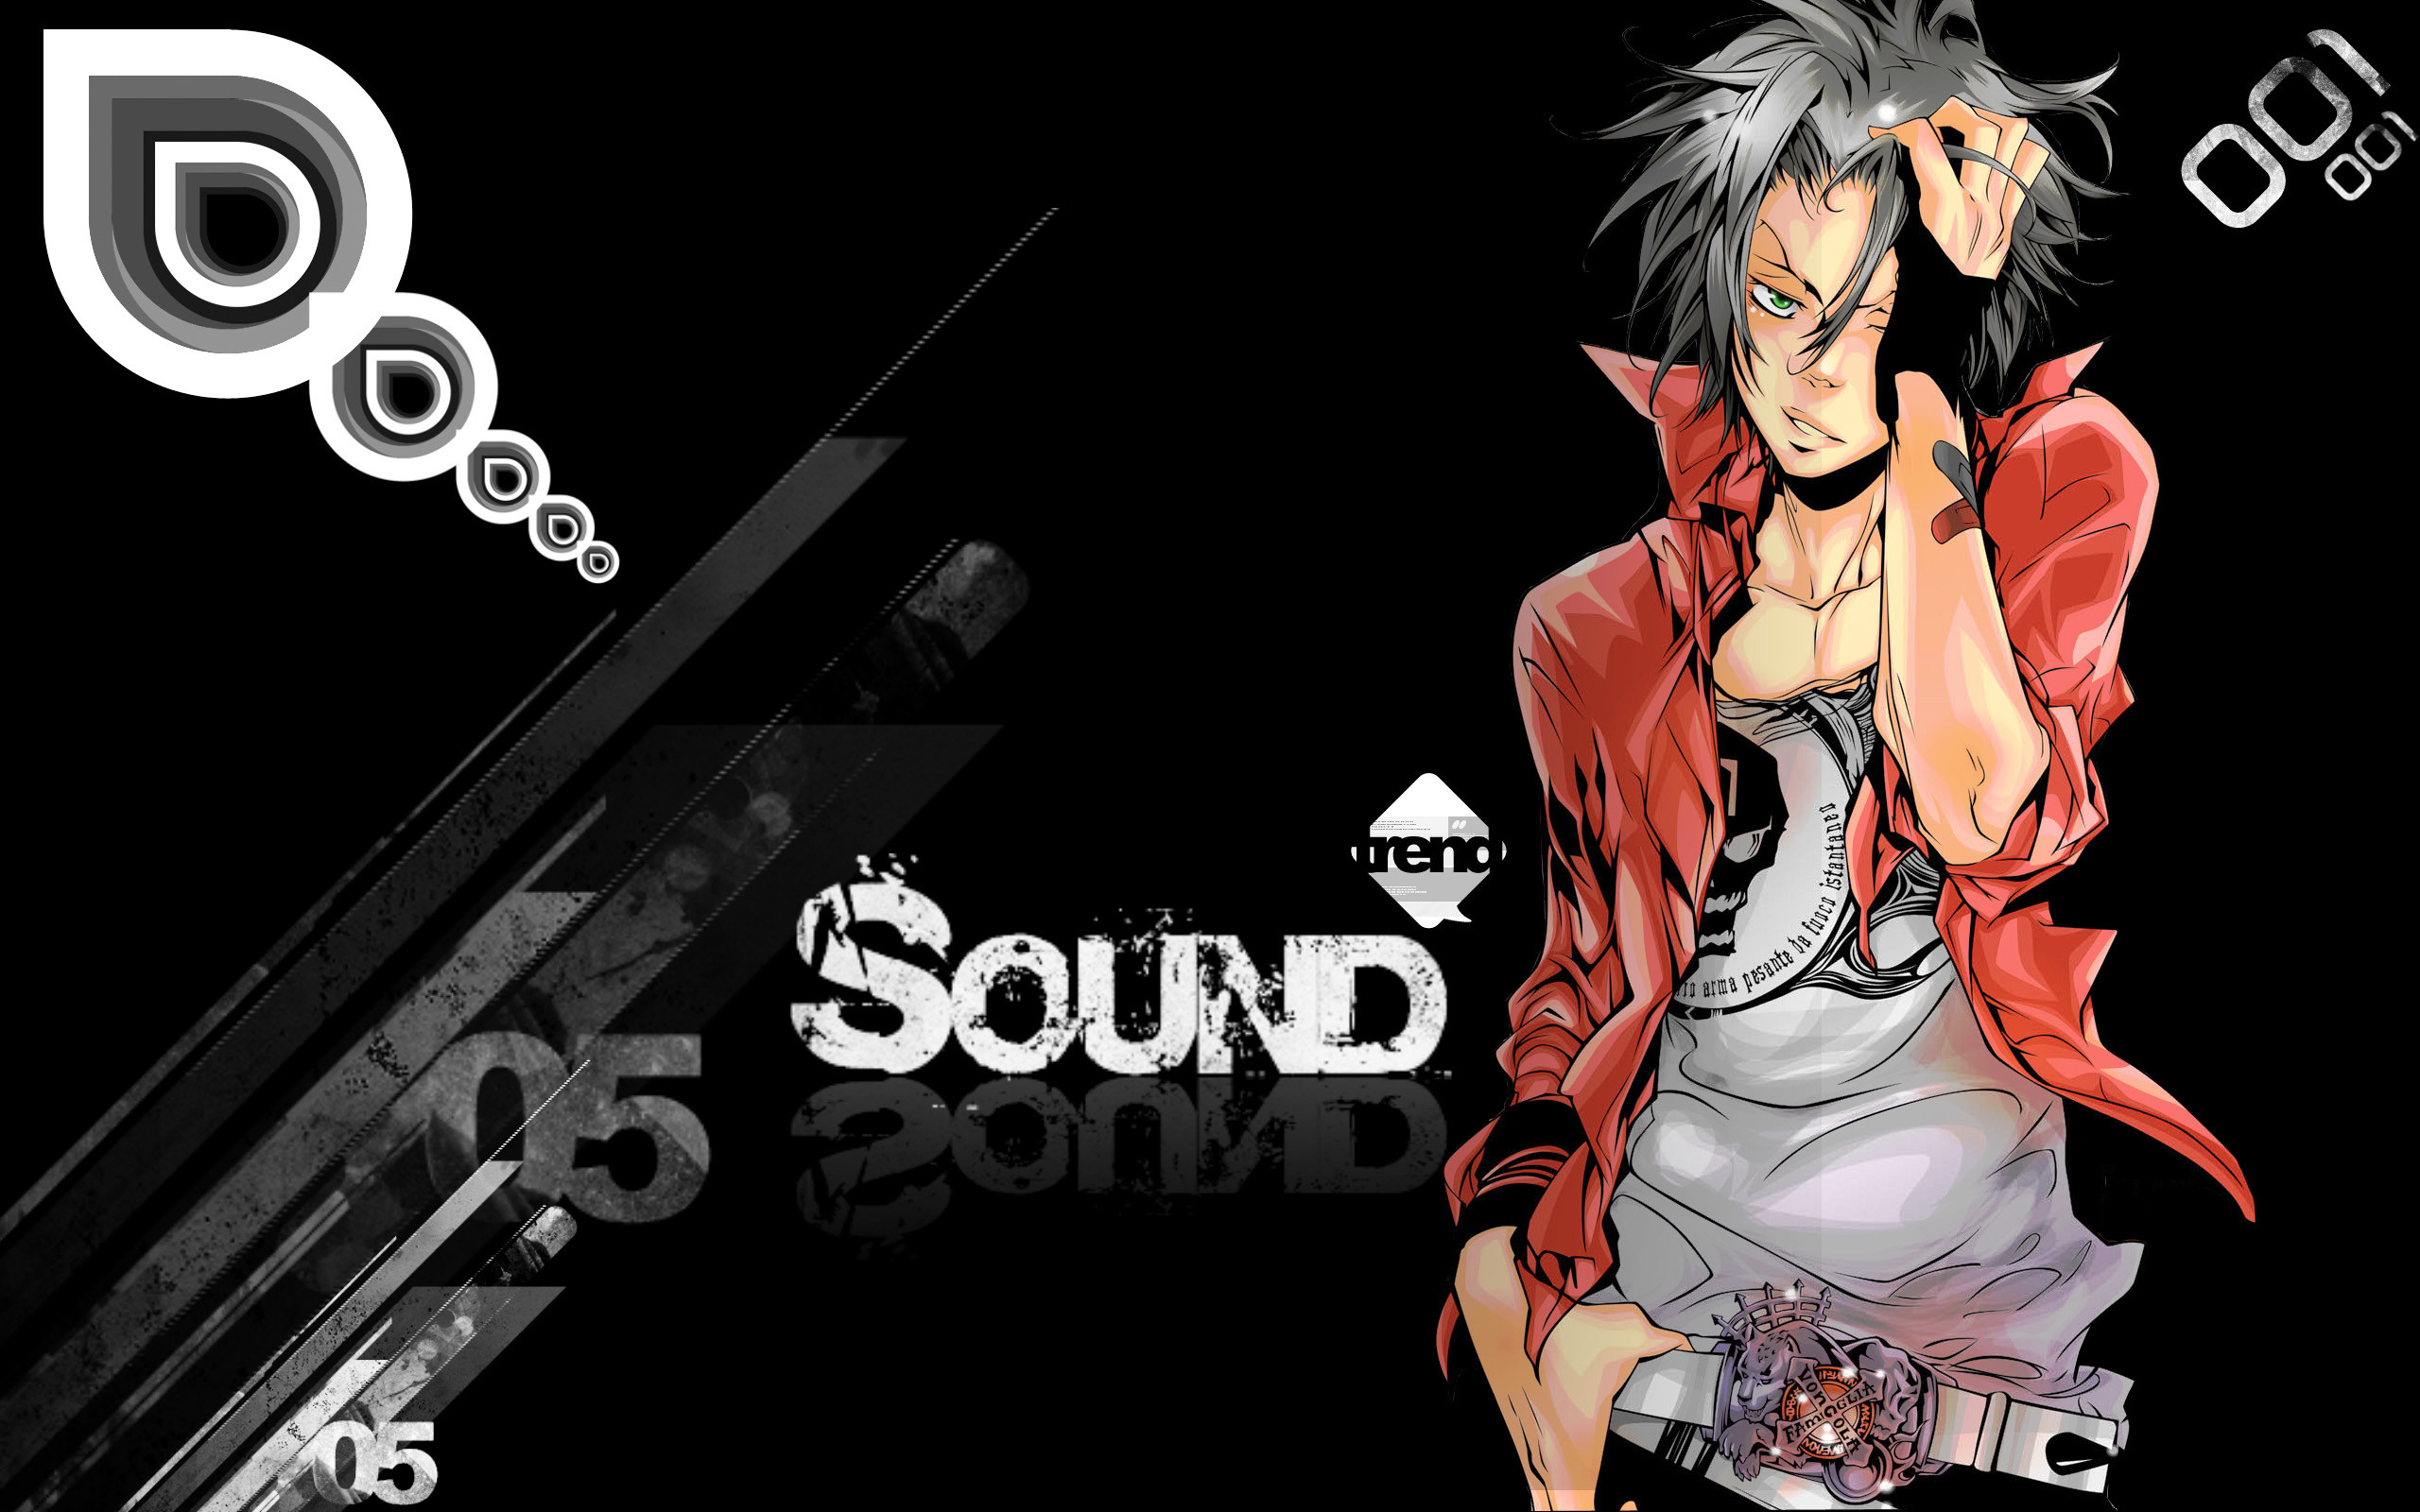 Anime Katekyō Hitman Reborn! Anime Hd Cool Red Black Colors Sound Smart  Male Beautiful Music